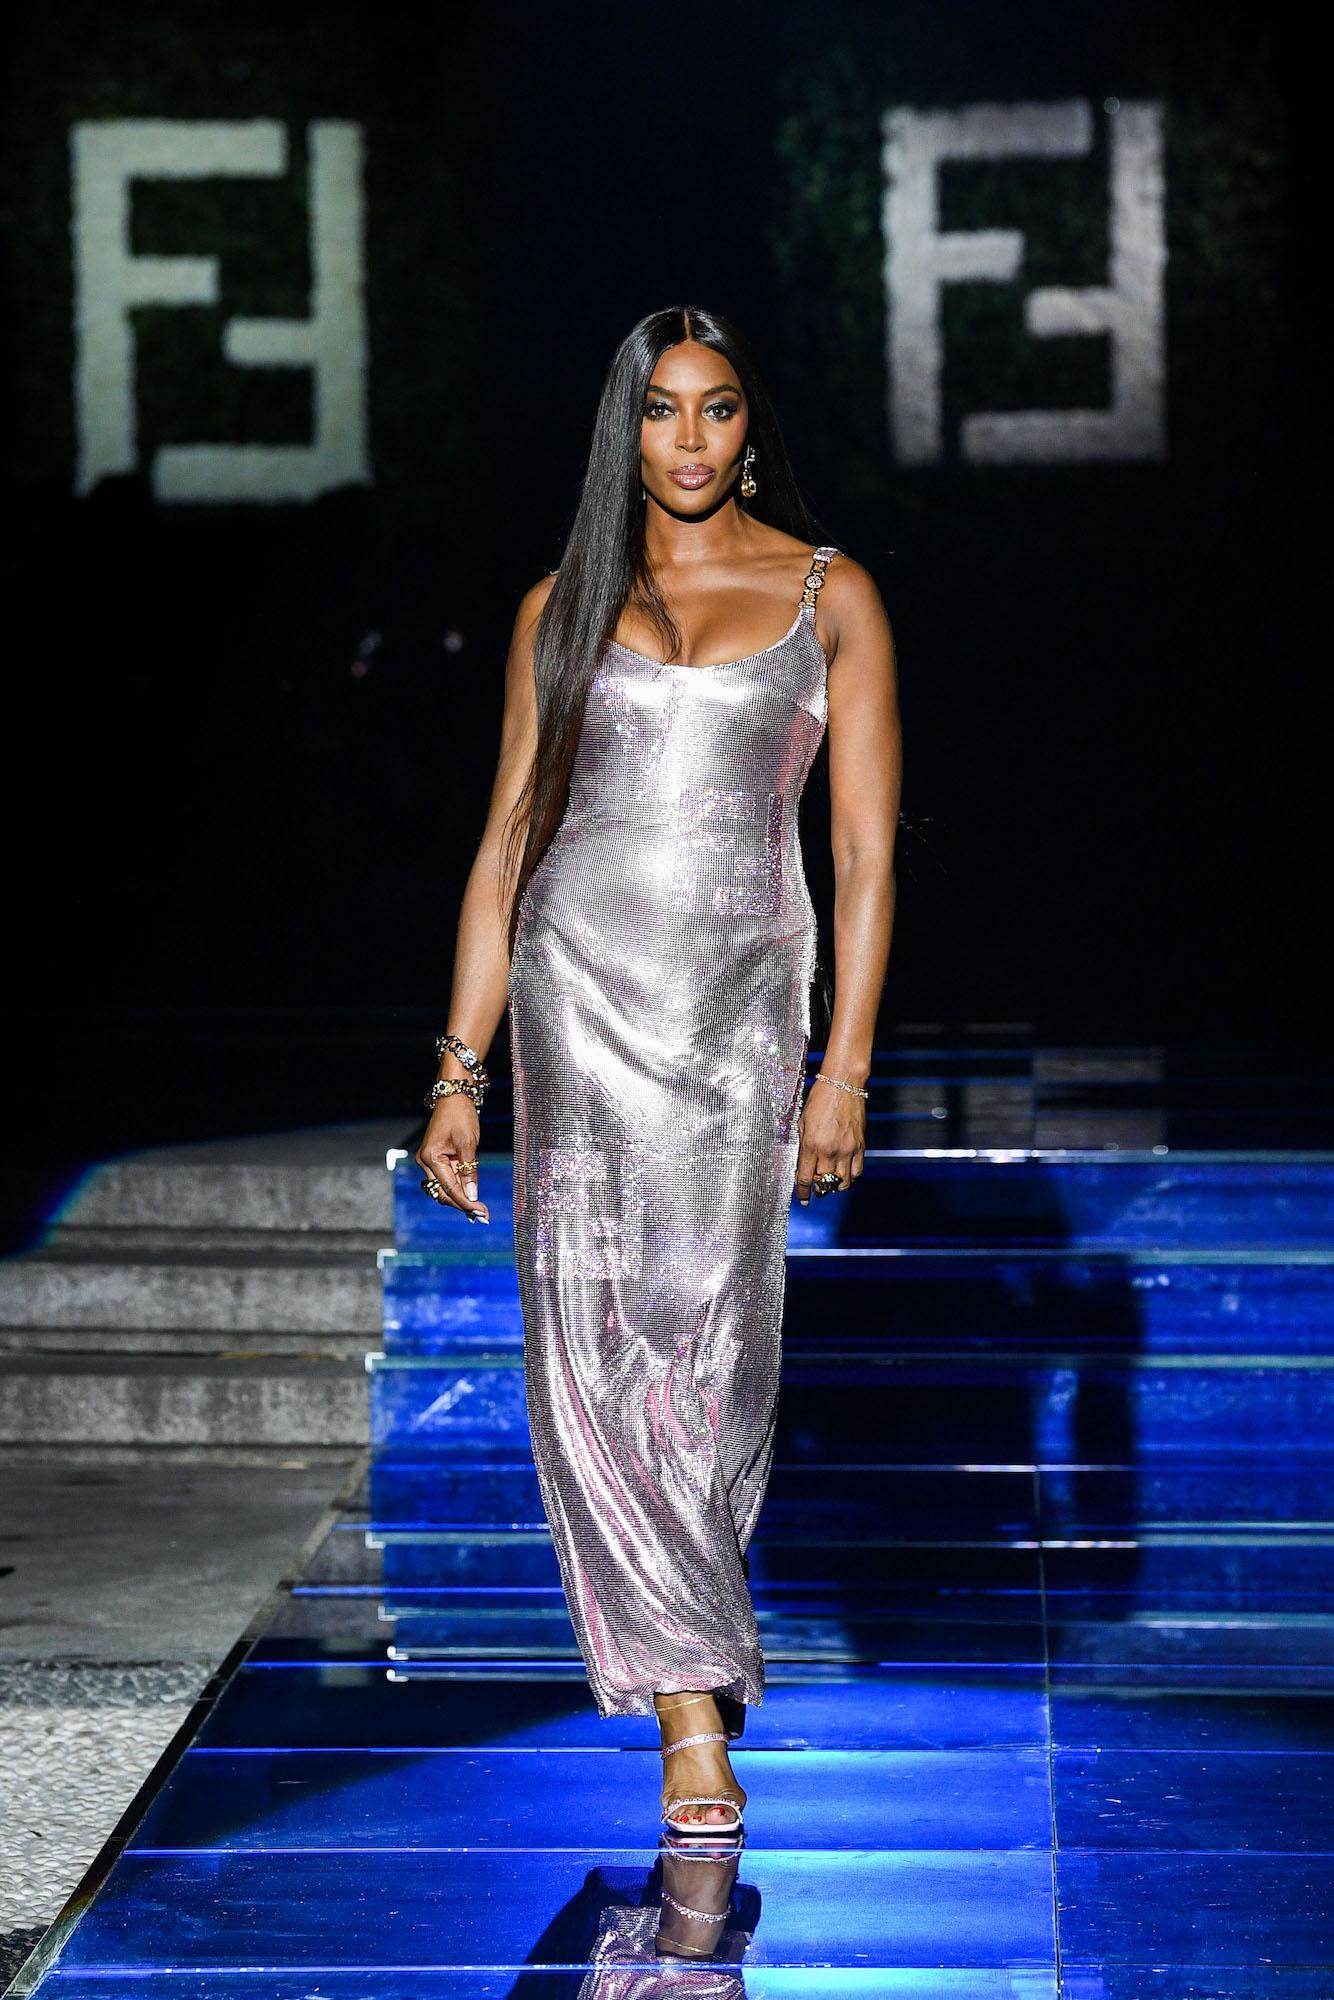 fendi by versace (25)